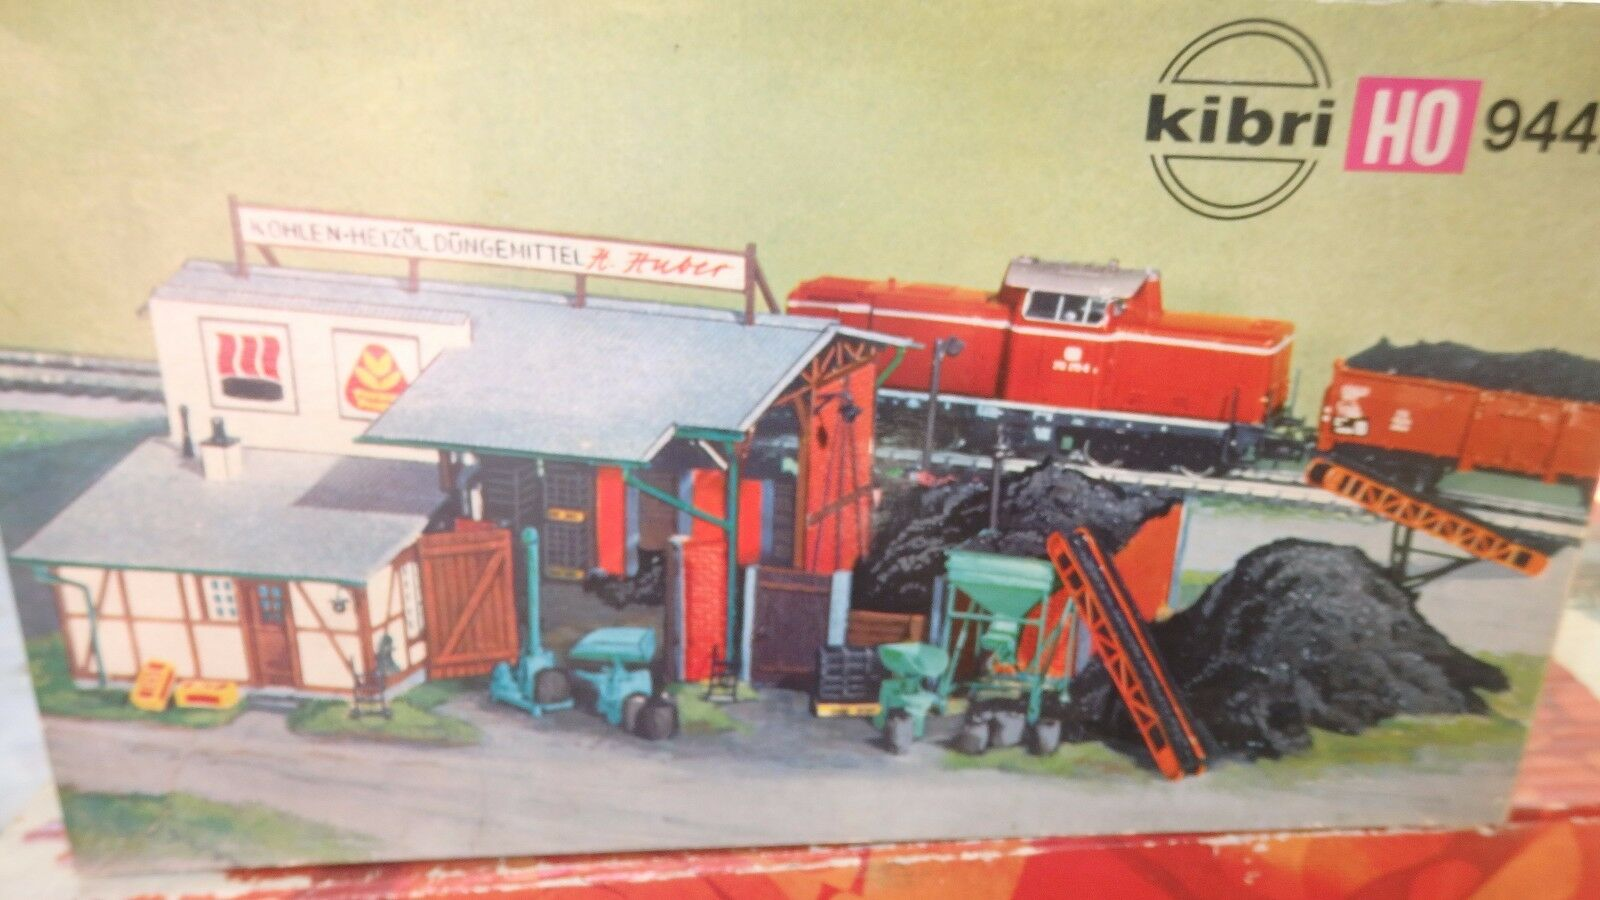 Kibri B-9442 Kohlen-Heizöl-Düngemitte Station Discharge Charcoal Ho 1 87